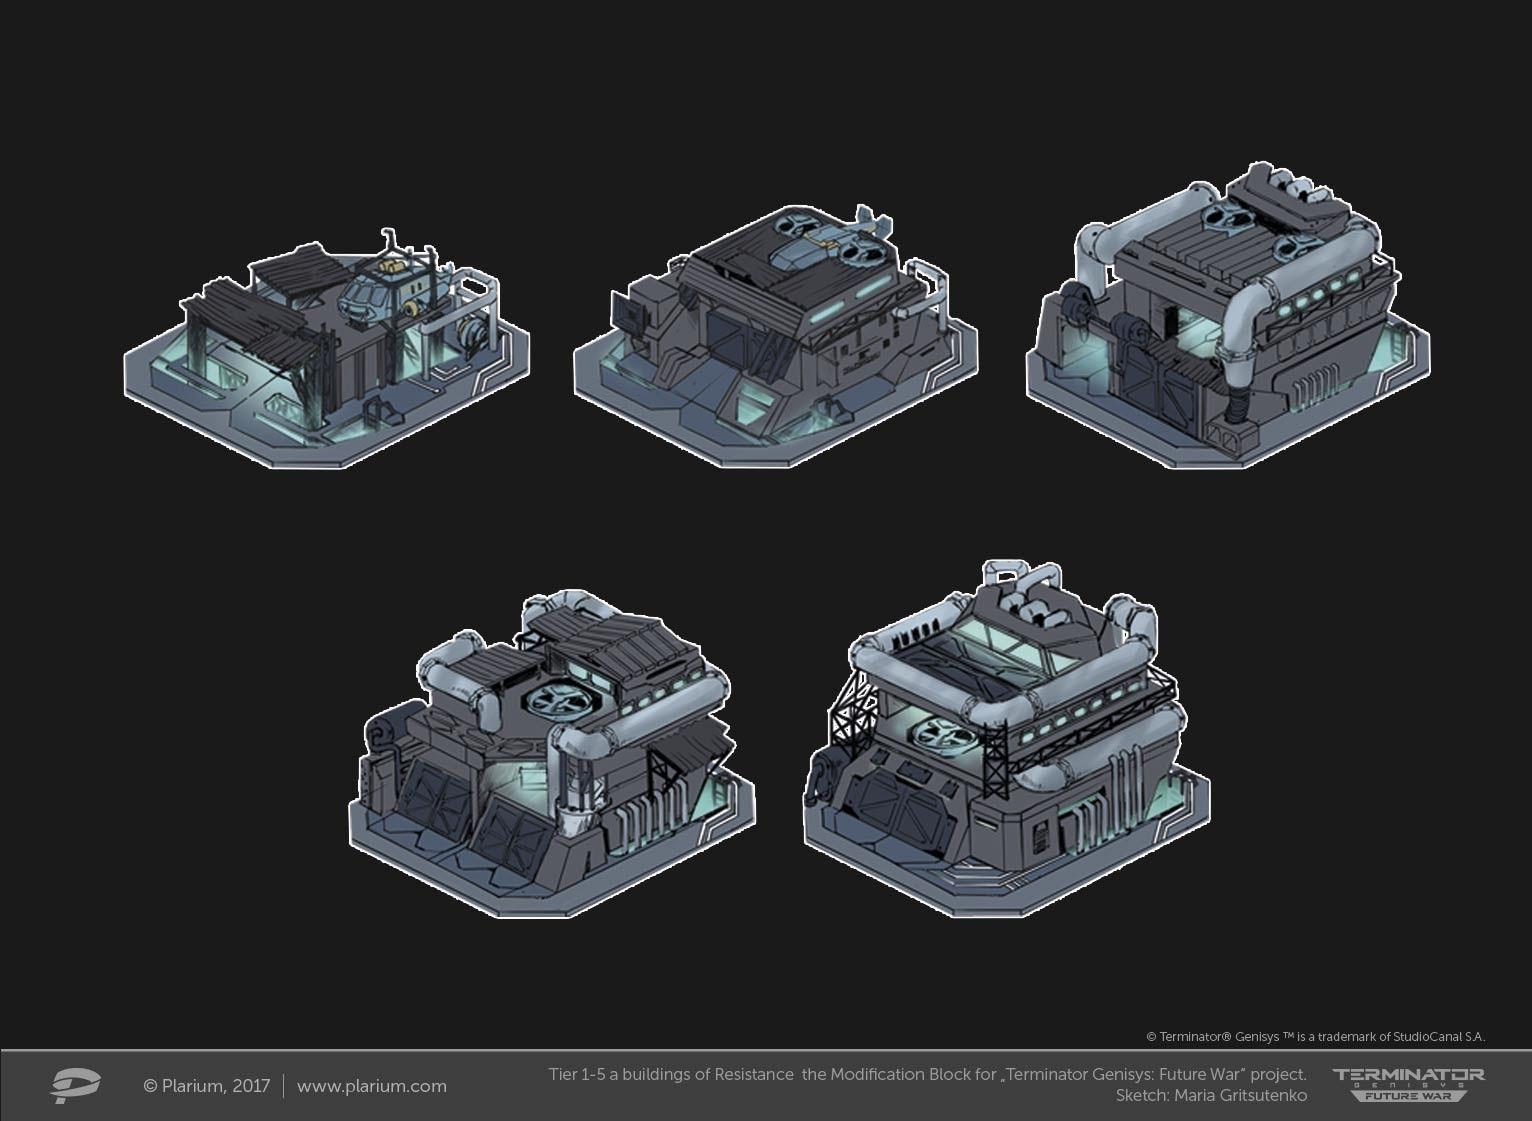 "ArtStation - Tiers 1-5 a buildings the Modification Block for ""Terminator Genesis: Future War"" project, Maria Gritsutenko"